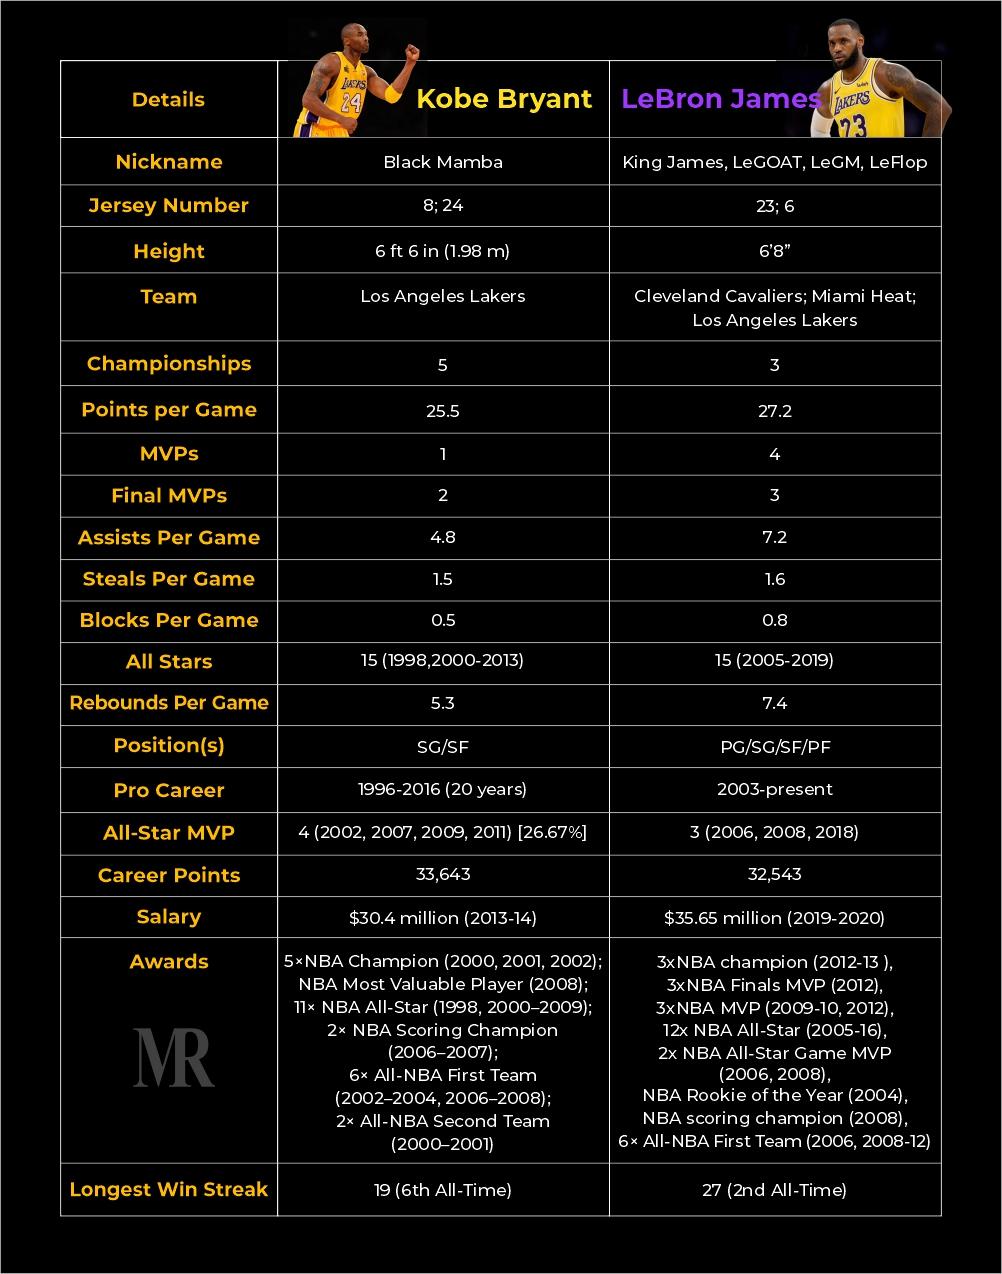 Kobe Bryant Vs Lebron James comparison score cards